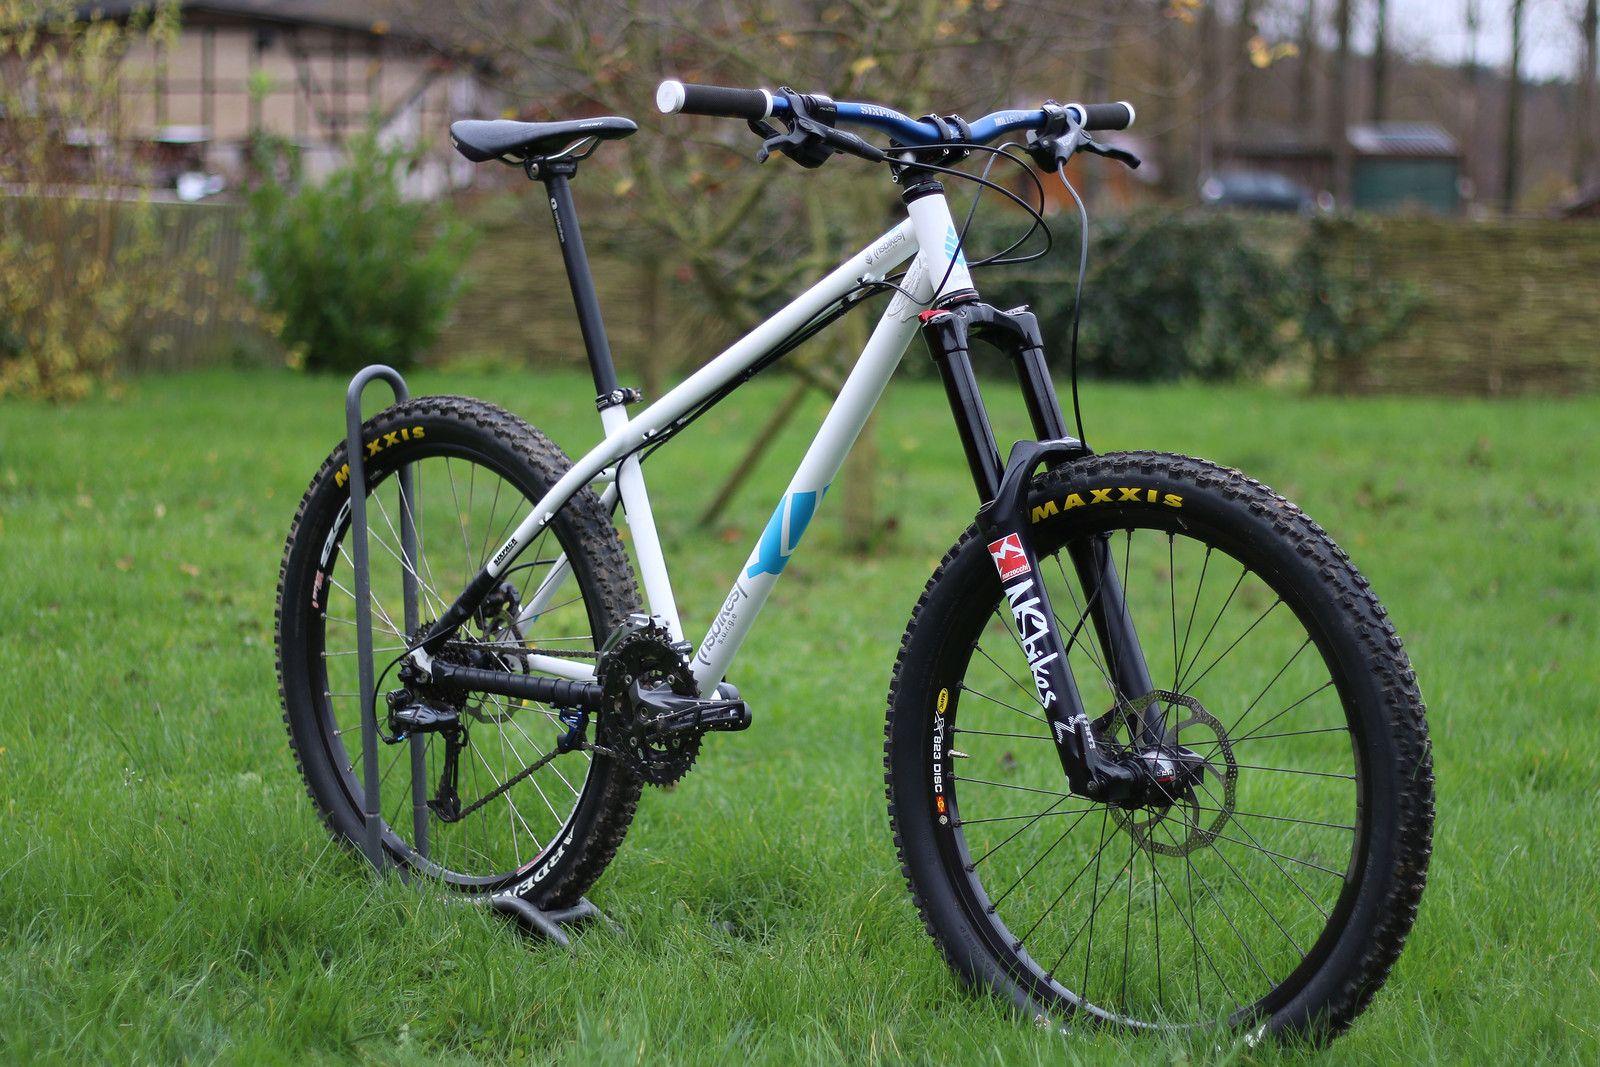 ns bikes surge hardtail enduro b for bikeology fahrrad sportger te und mtb. Black Bedroom Furniture Sets. Home Design Ideas